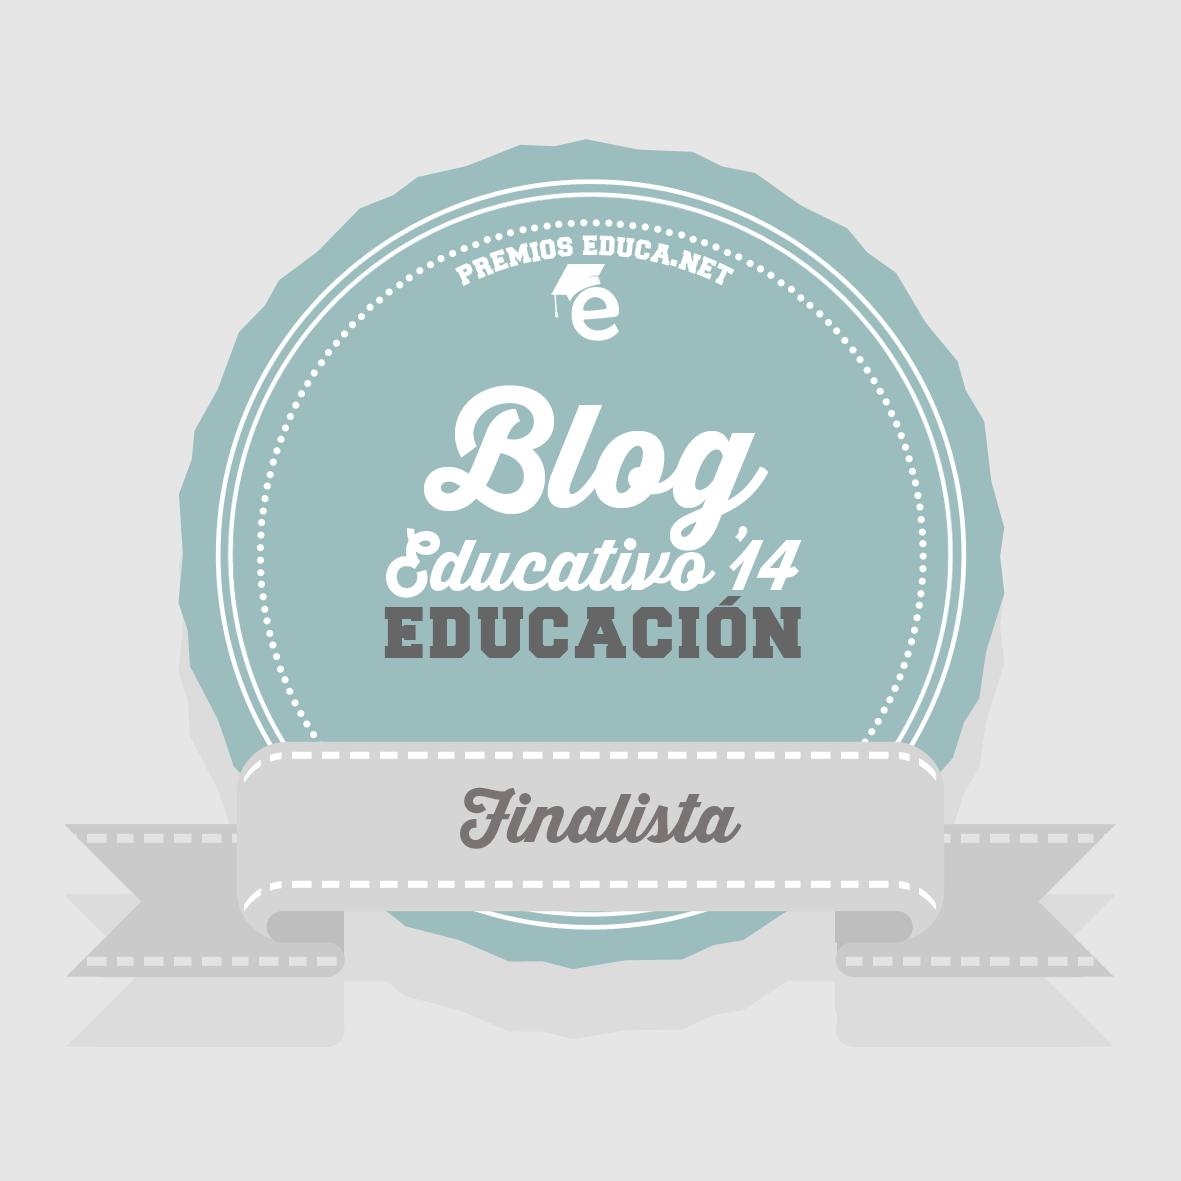 Premios Educa.net 14